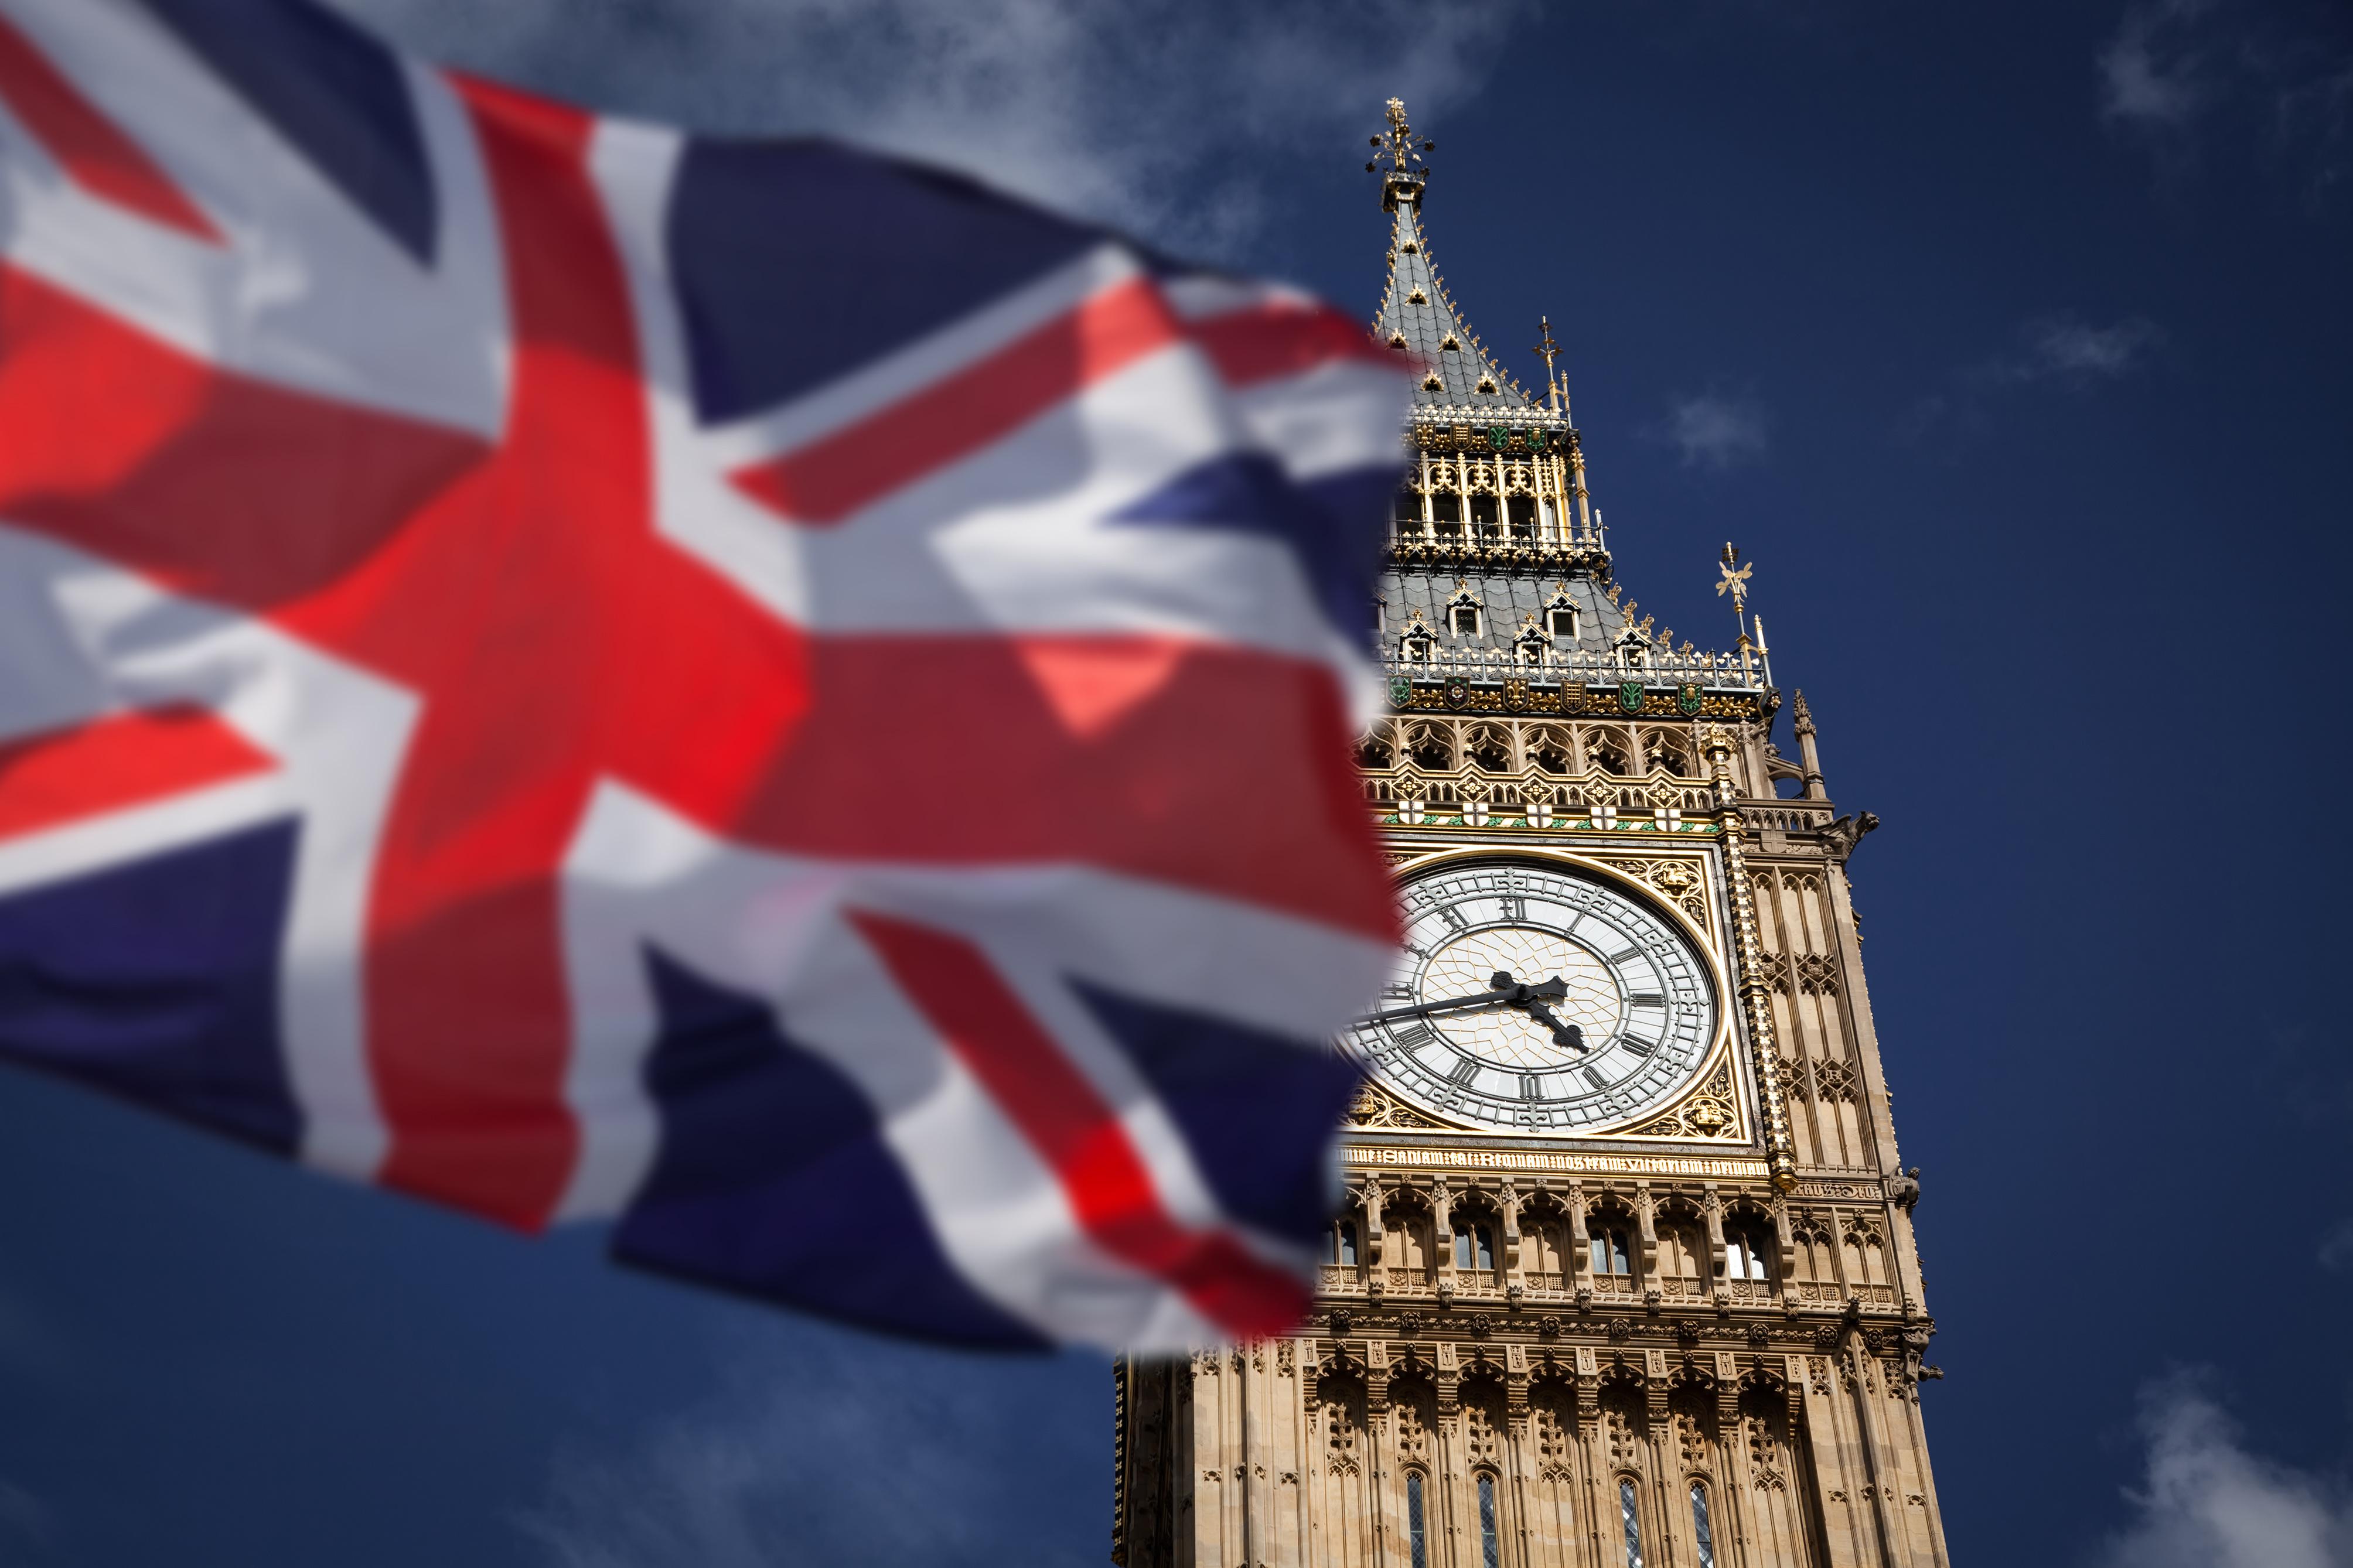 British flag big ben